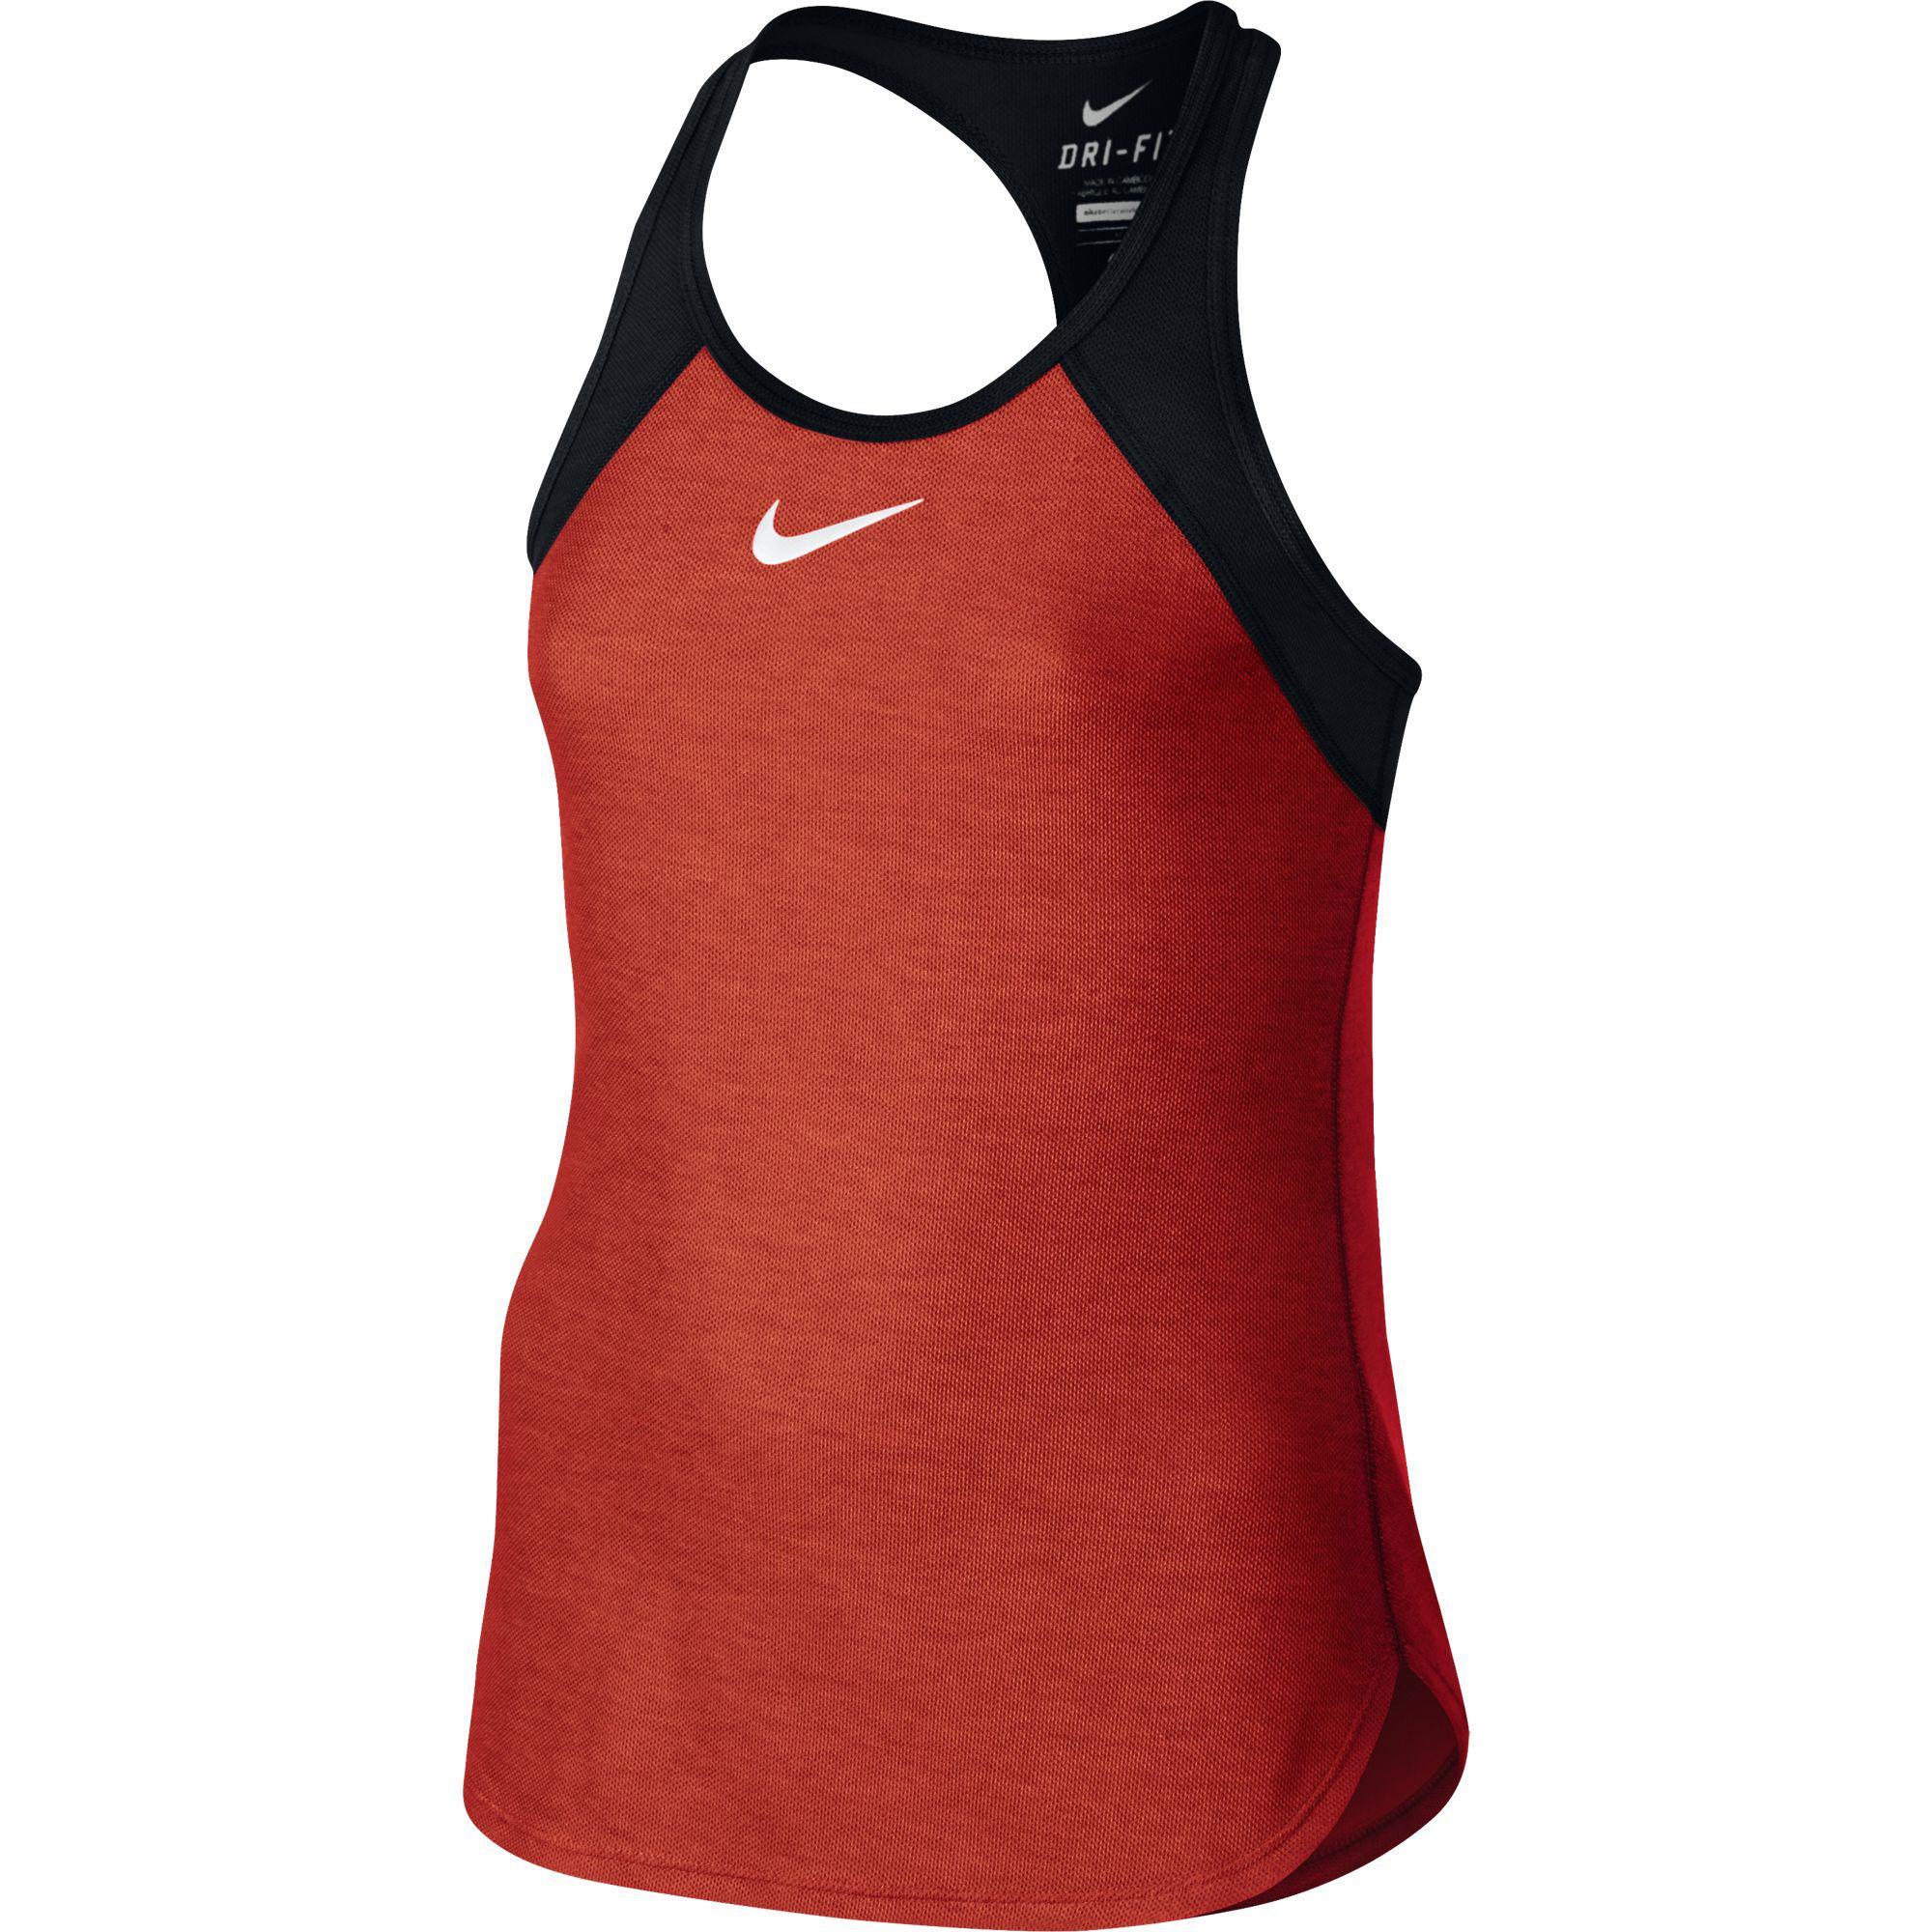 ab31e72b24ef Nike Girls Slam Tank - Light Crimson Black - Tennisnuts.com